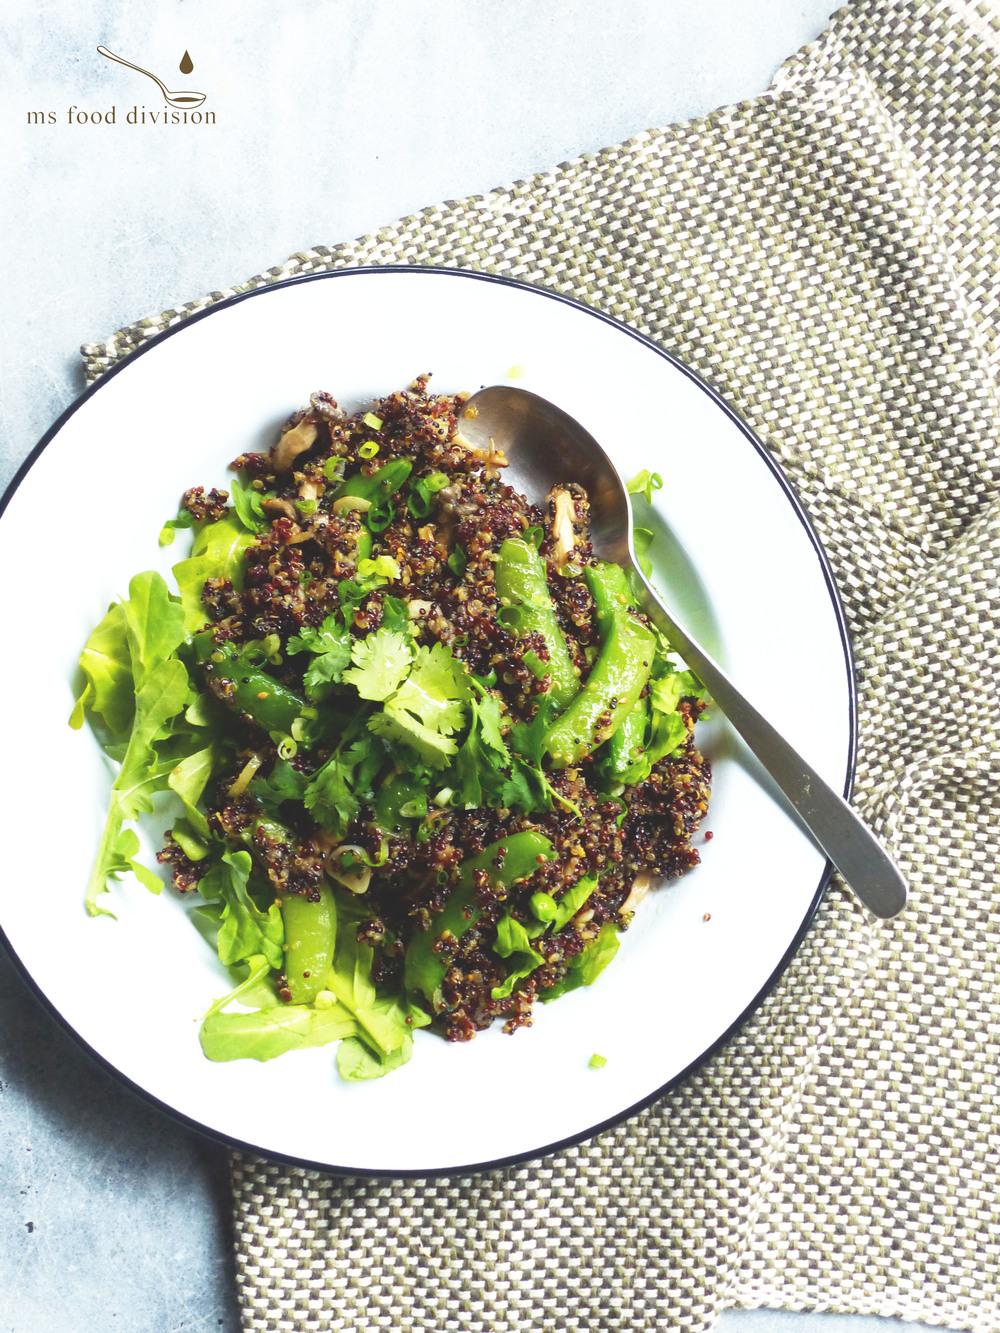 stir fry gingery mushroom & sugar snap peas quinoa salad